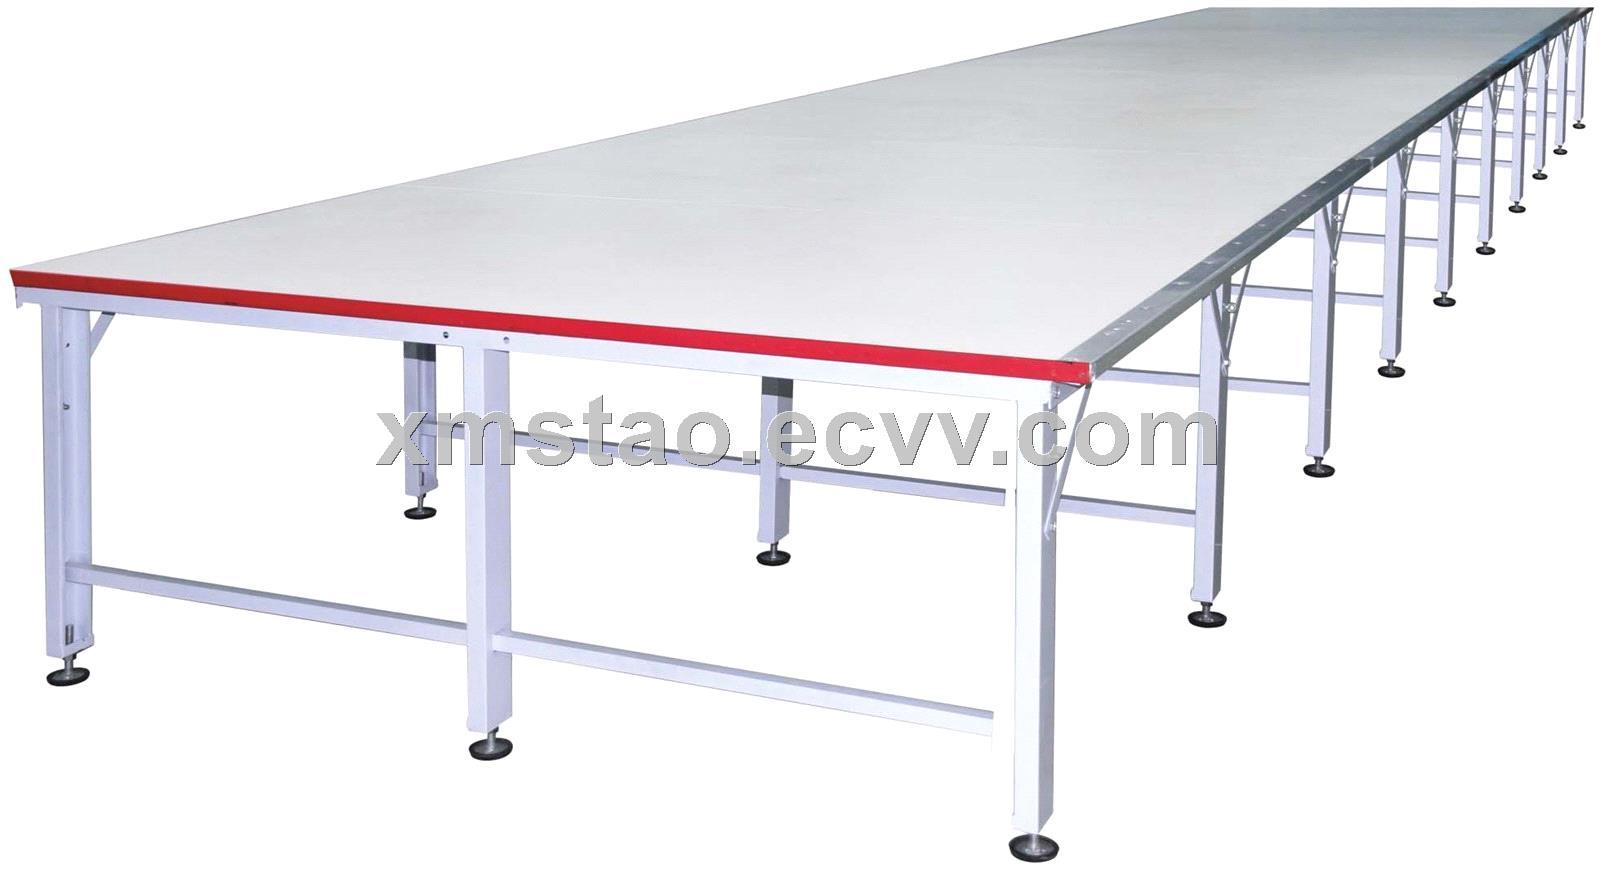 Cutting board apparel cutting table air blower table purchasing cutting board apparel cutting table air blower table watchthetrailerfo